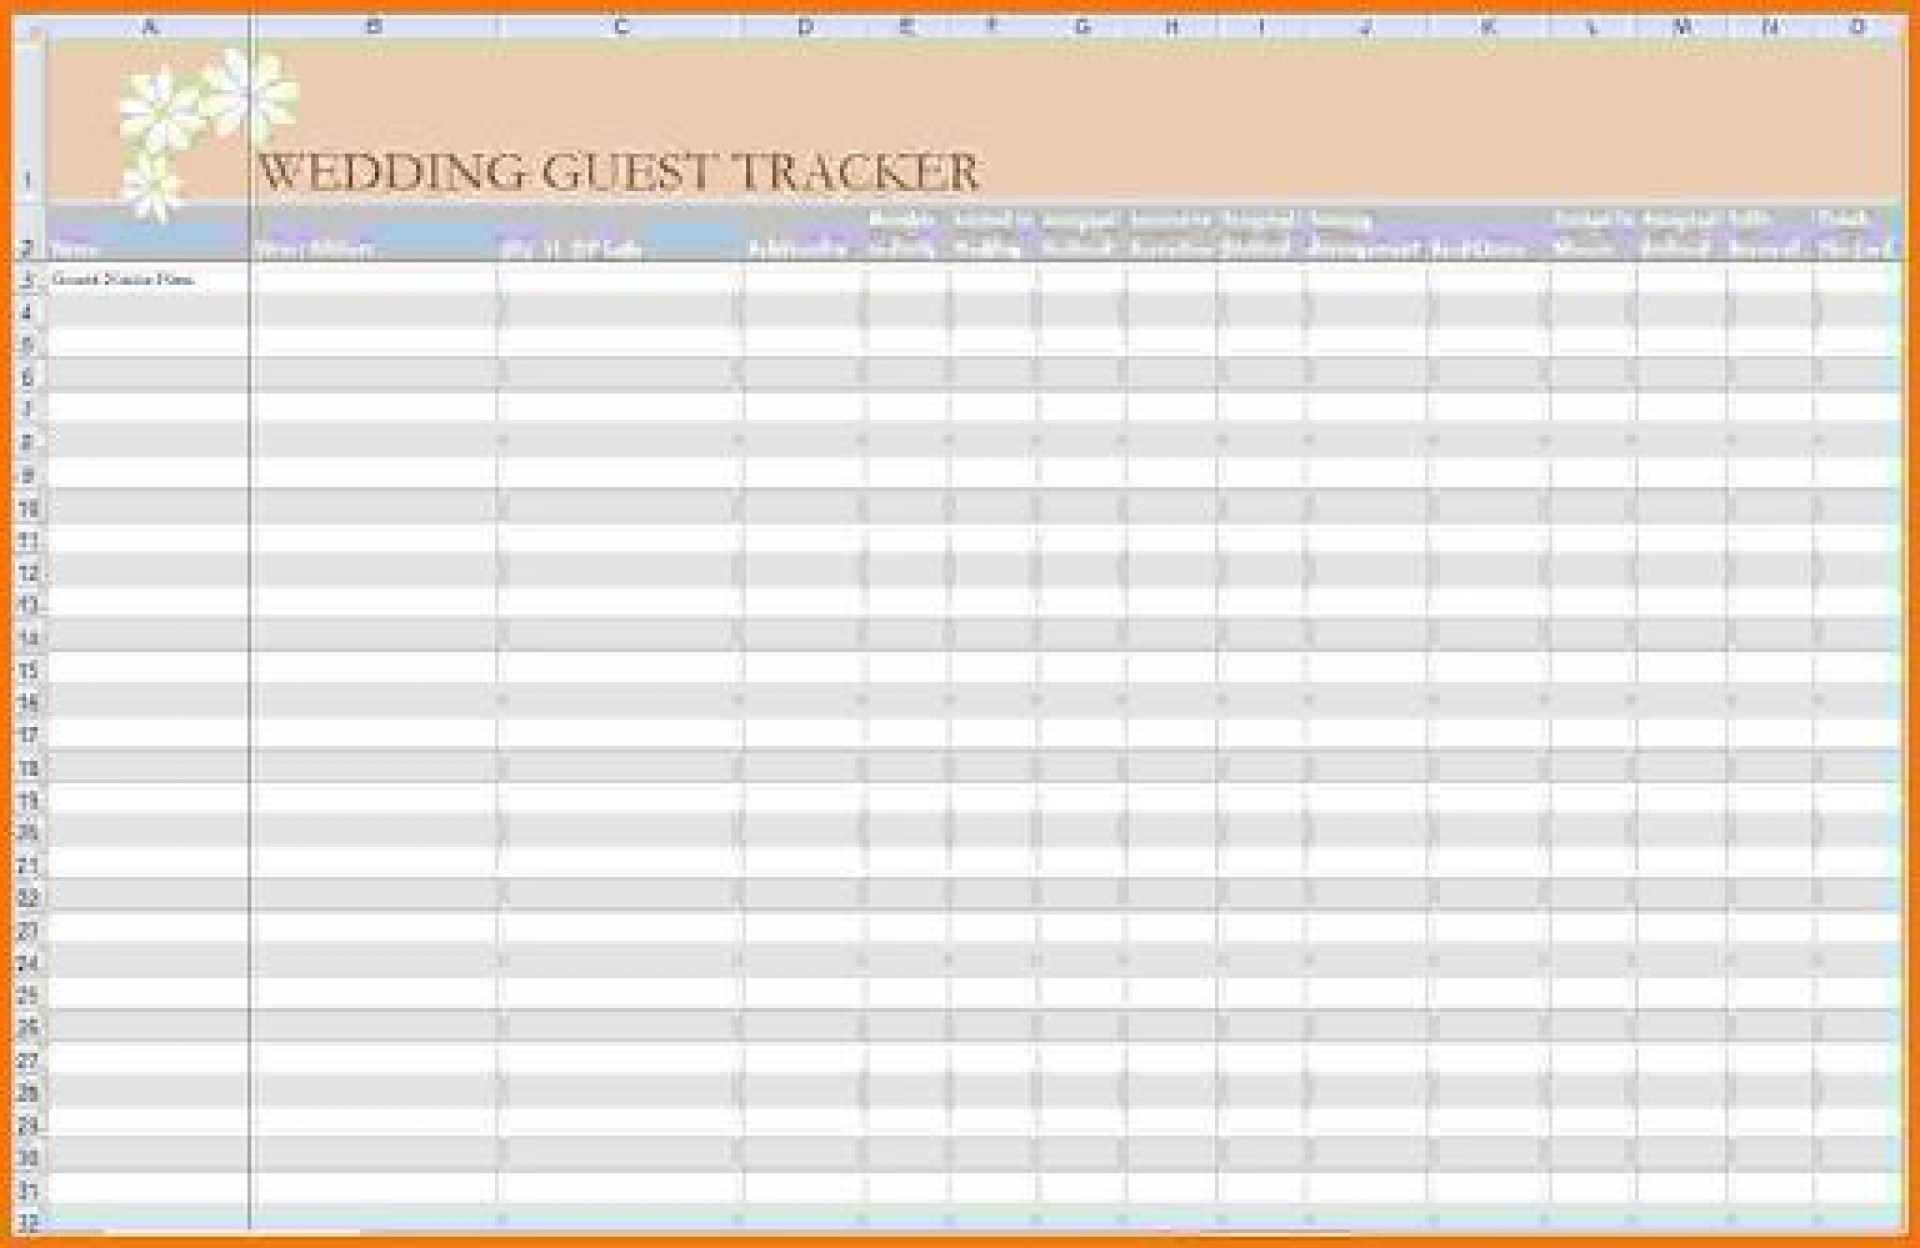 005 Astounding Rsvp Guest List Template Excel Inspiration 1920